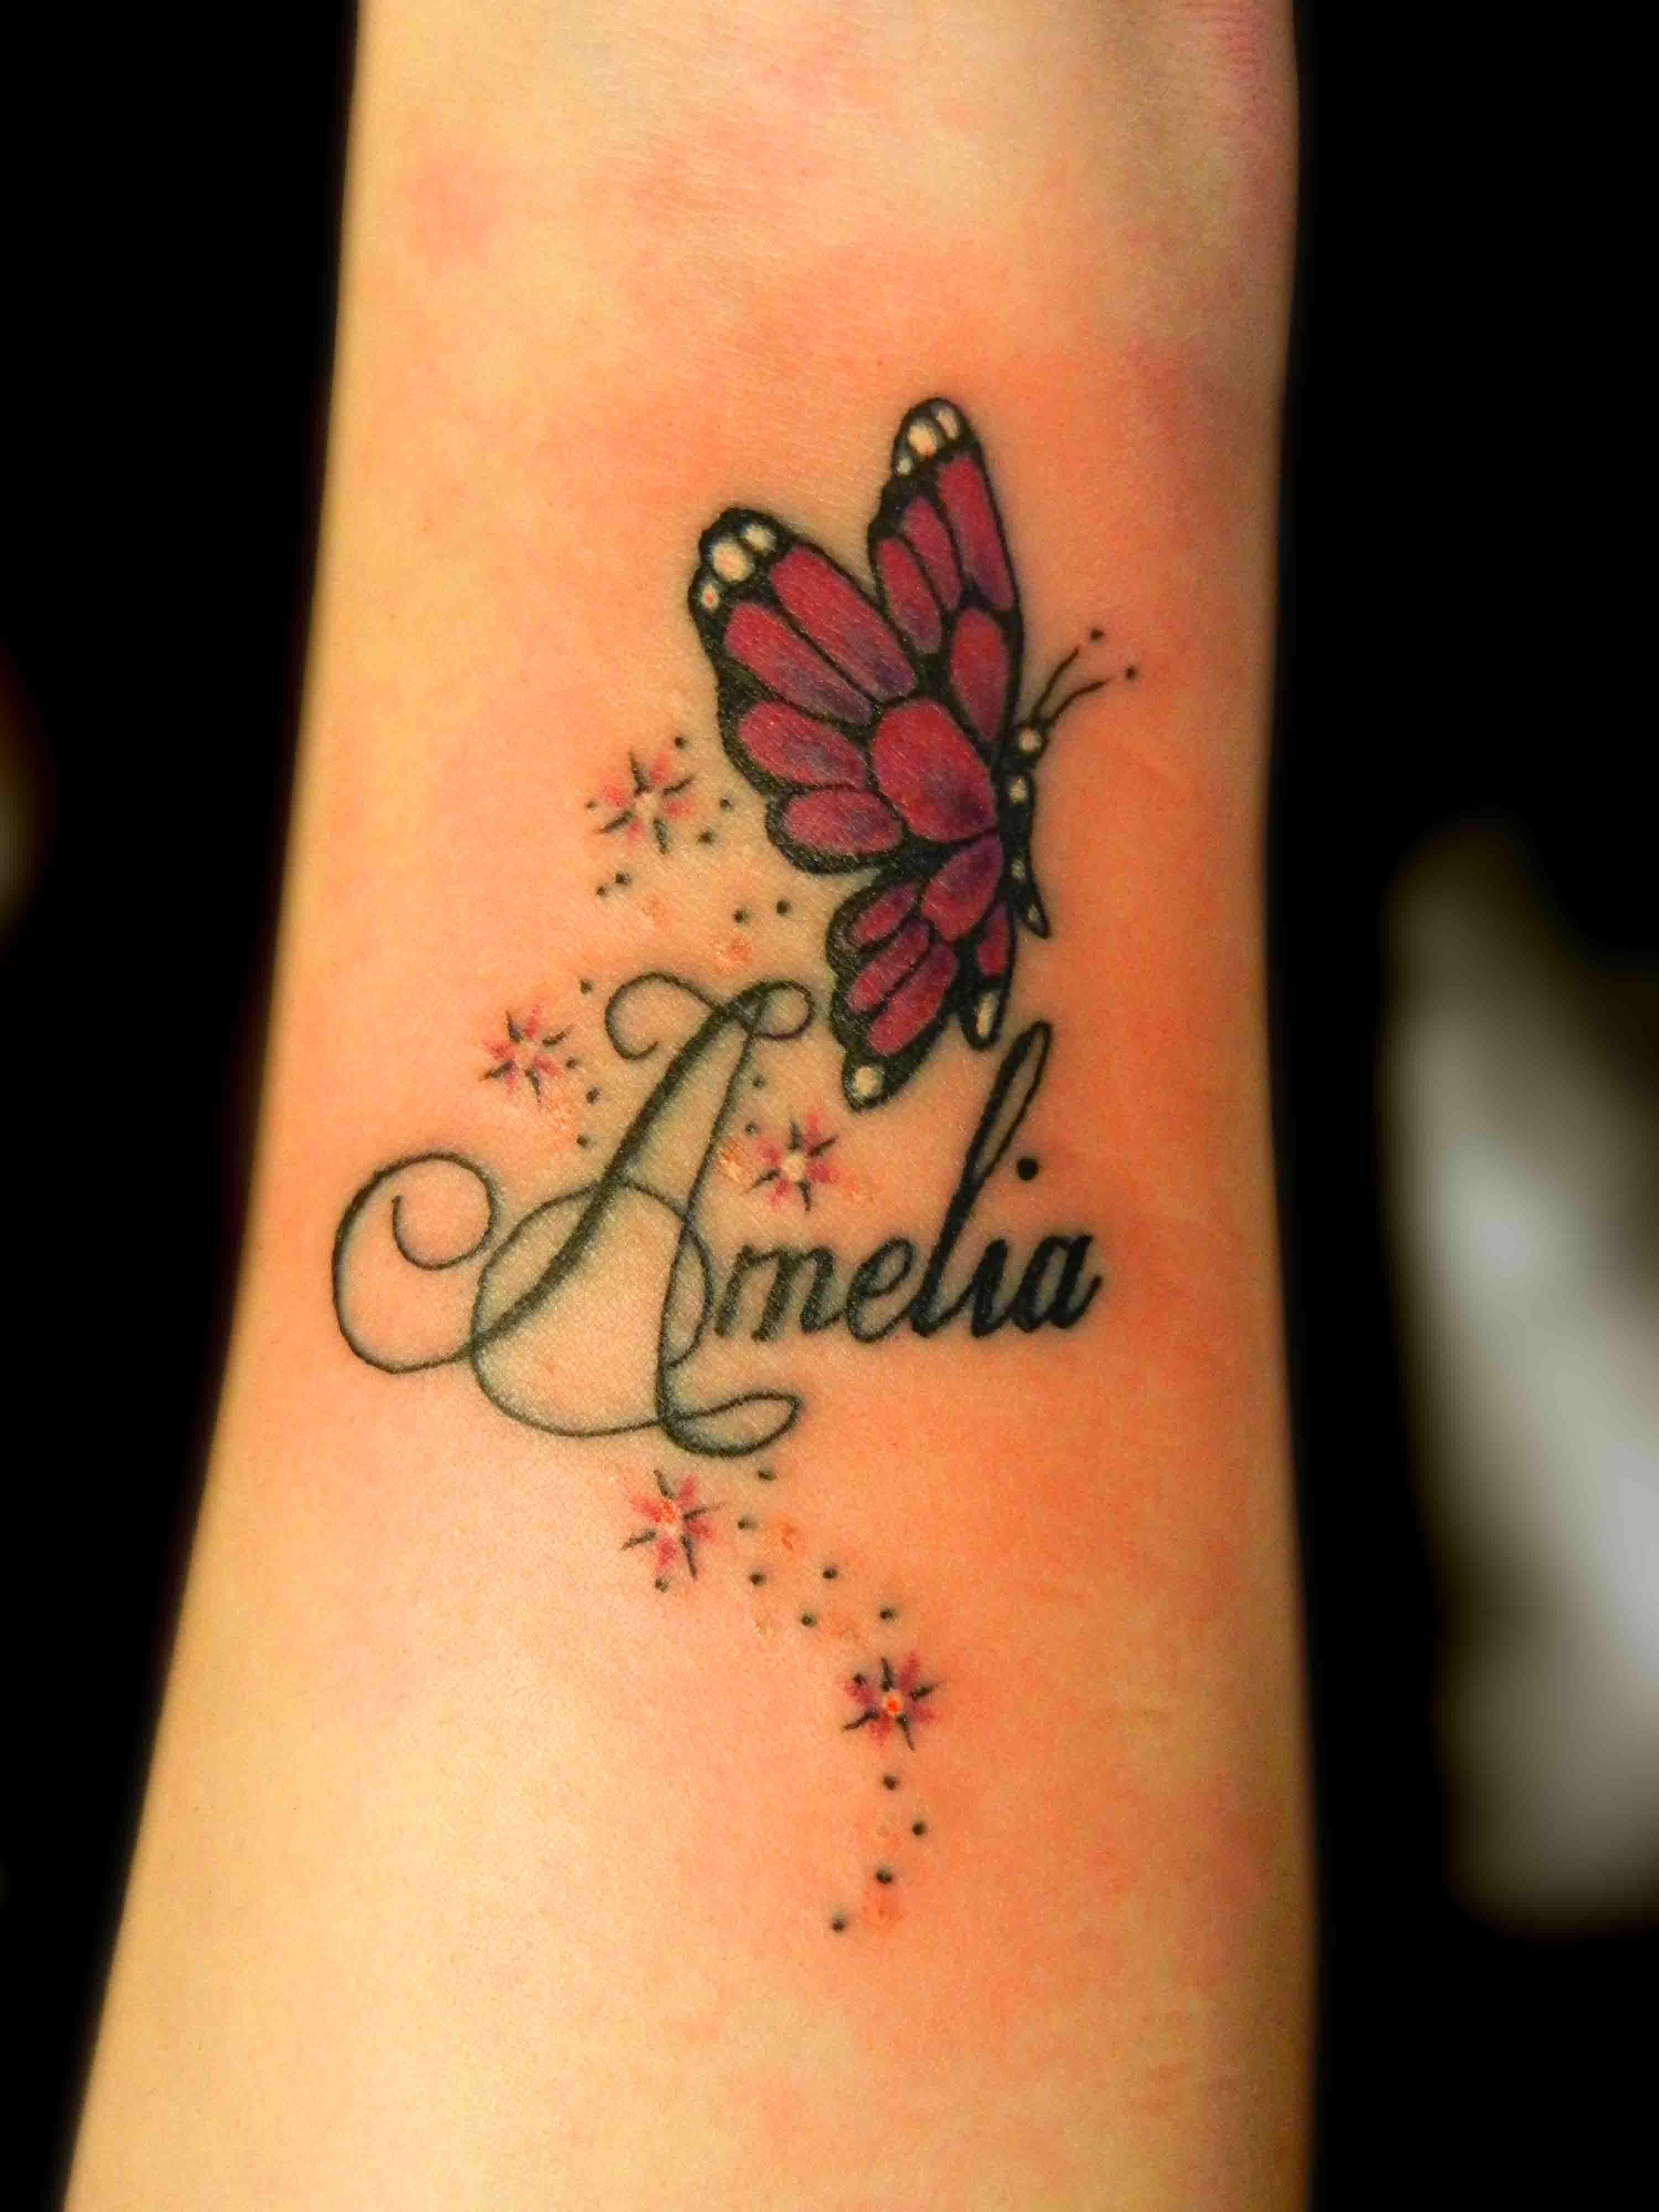 Tattoo Truro Butterfly Tattoo Stars Twinkles Pretty Wrist Girly 001 with measurements 3000 X 4000